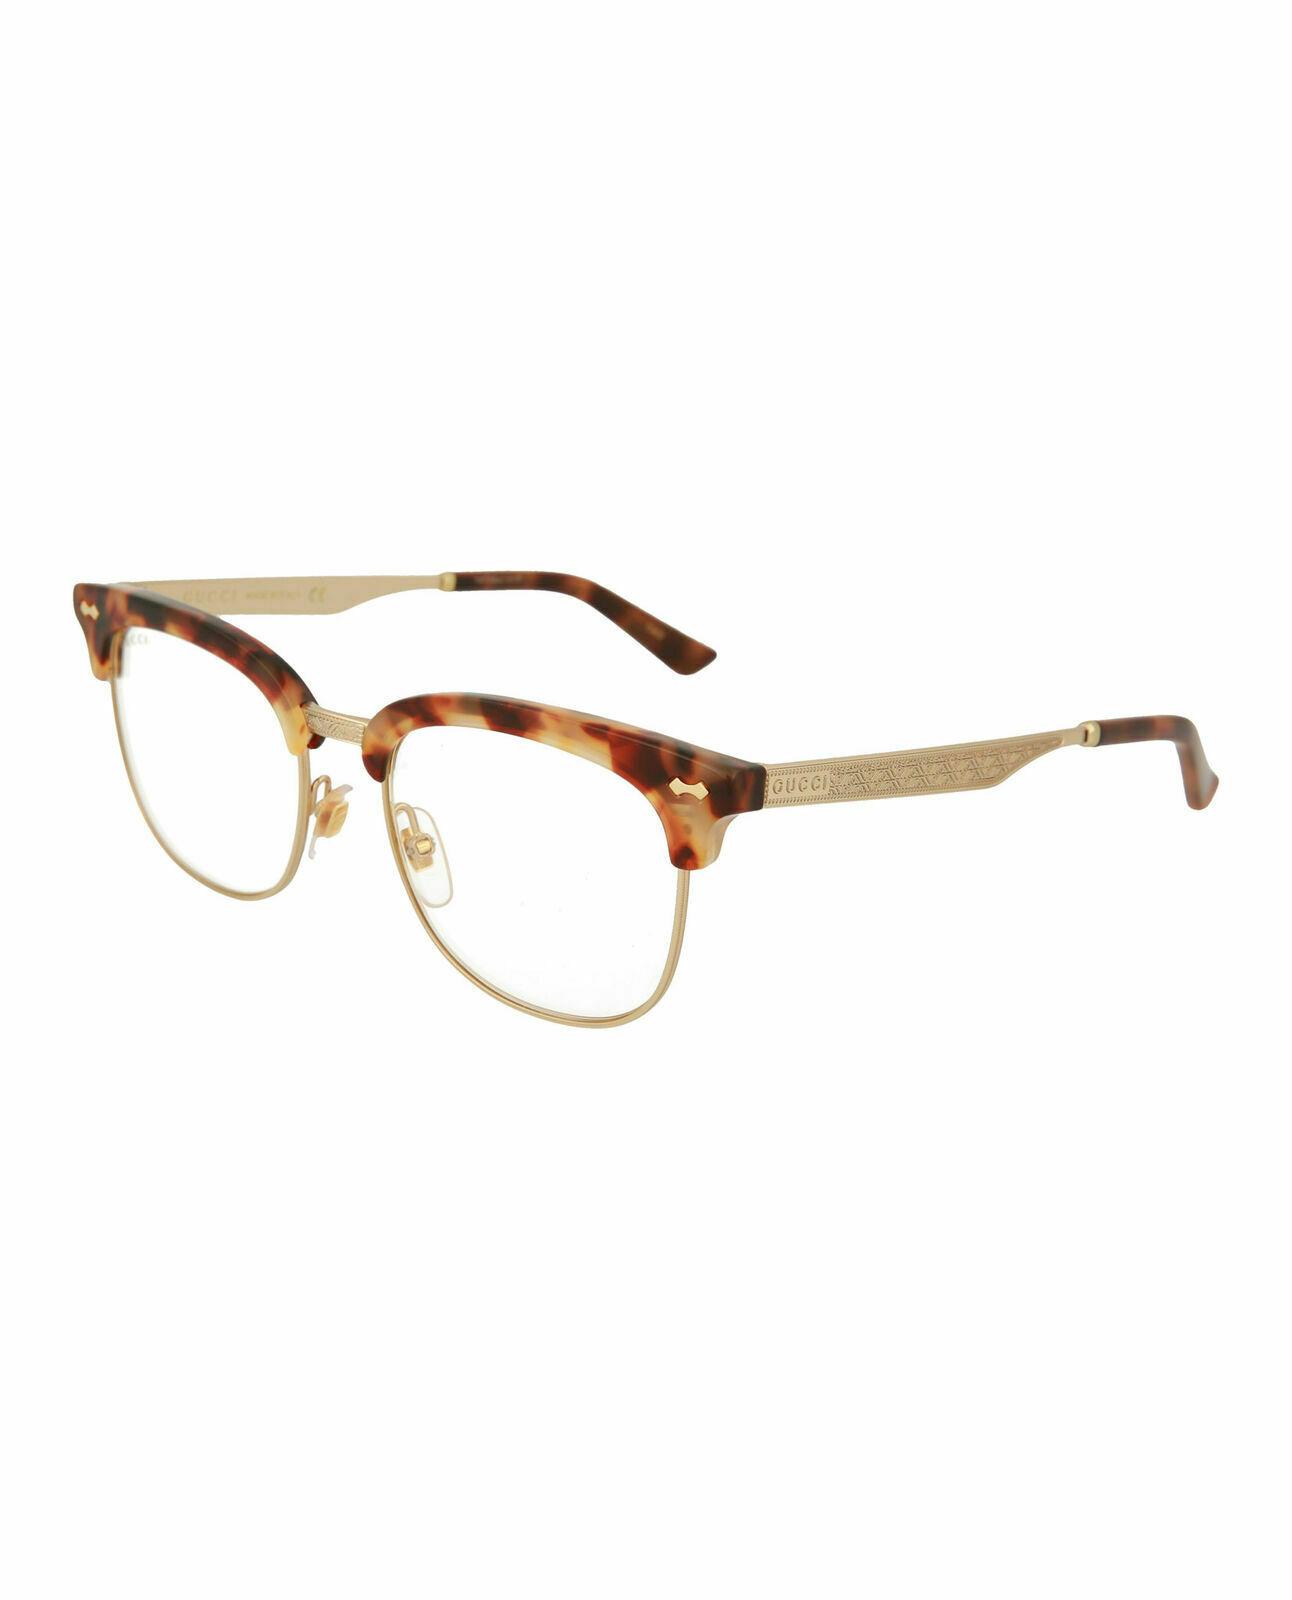 5a33dc32db493 Gucci Unisex   Sunglasses Transparent GG0051S 30000997 005 Gucci ...